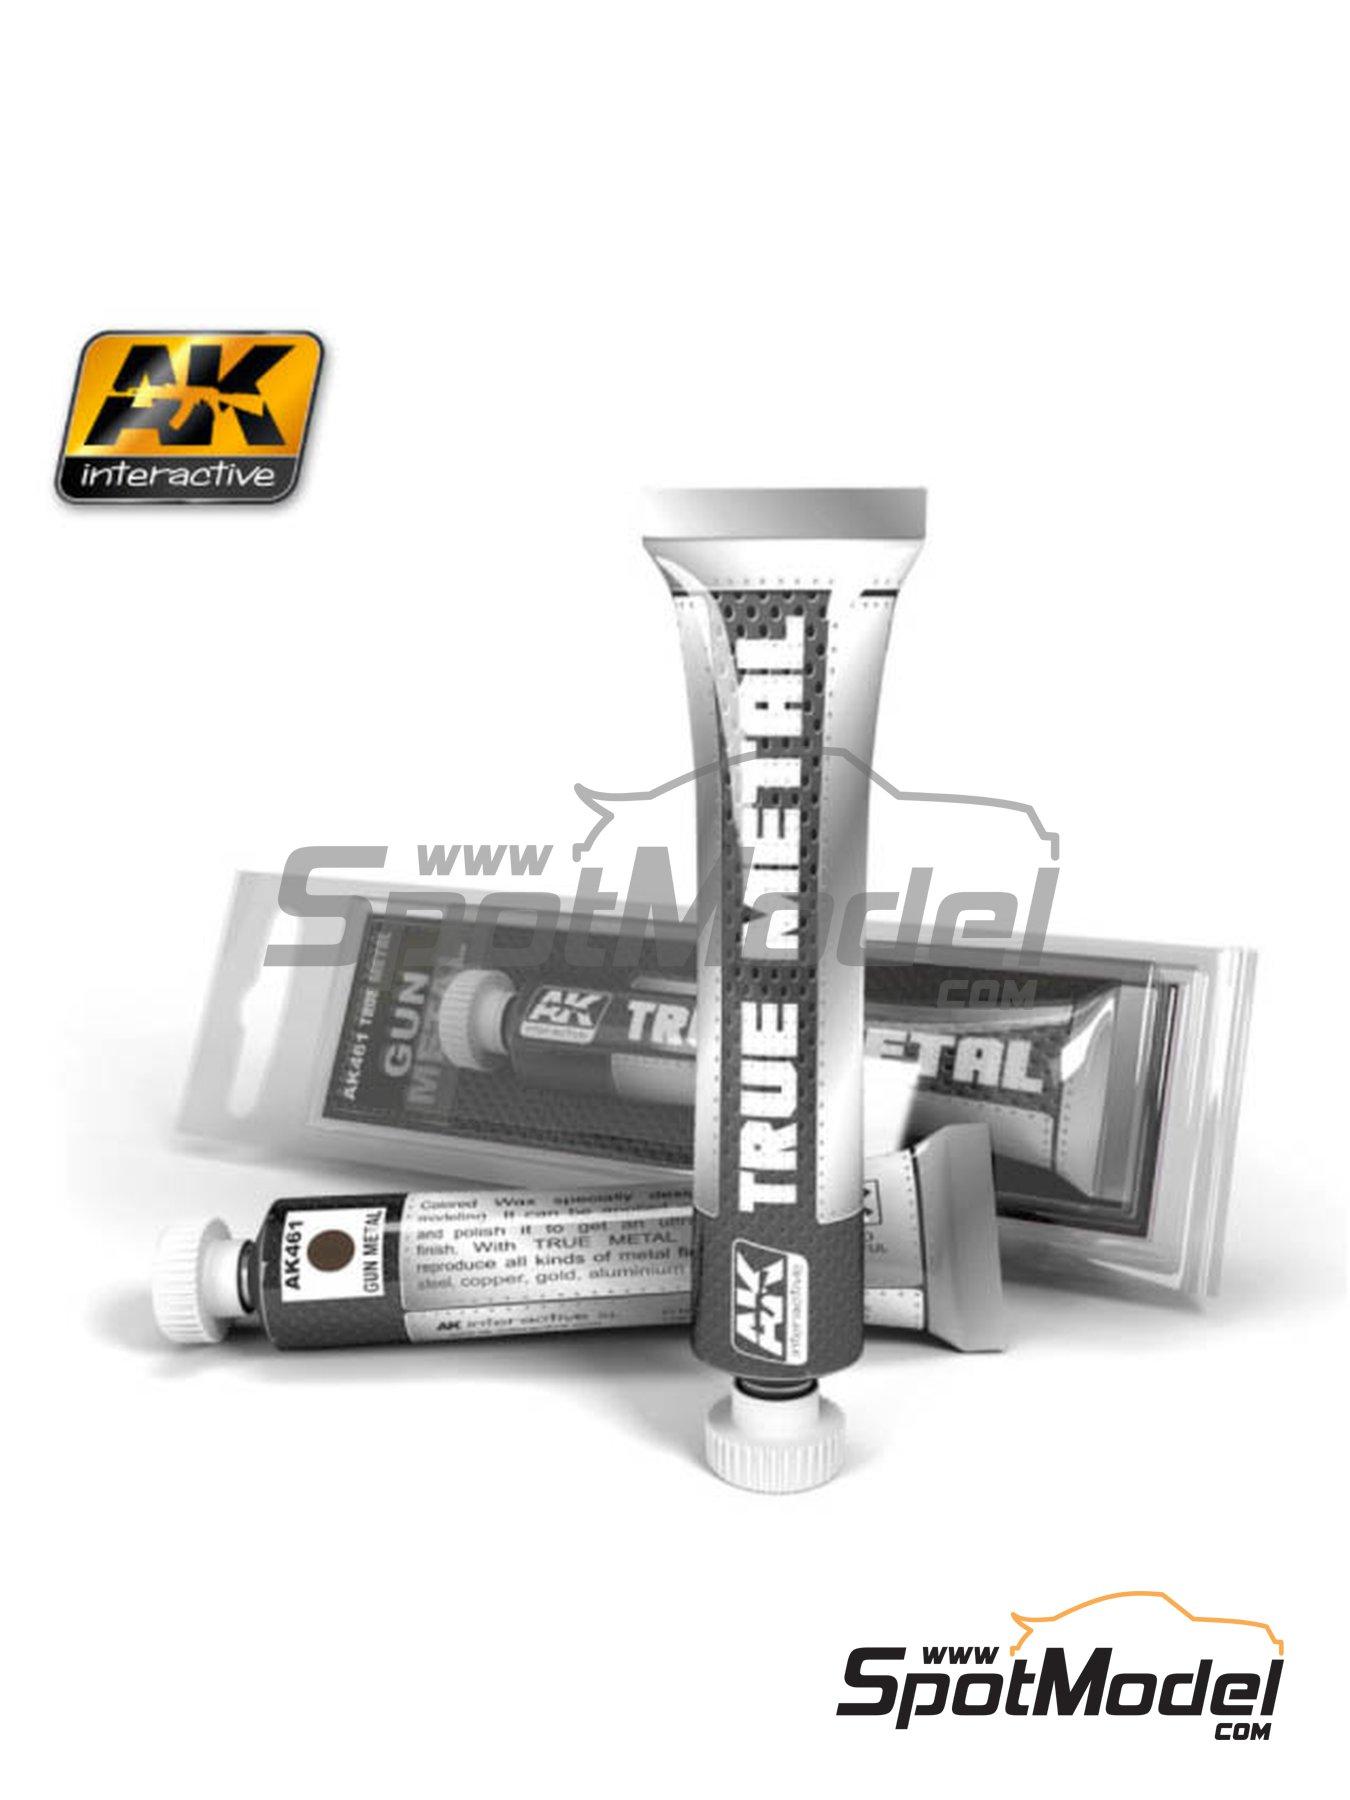 Gris metalizado oscuro | AK True Metal fabricado por AK Interactive (ref.AK-461) image